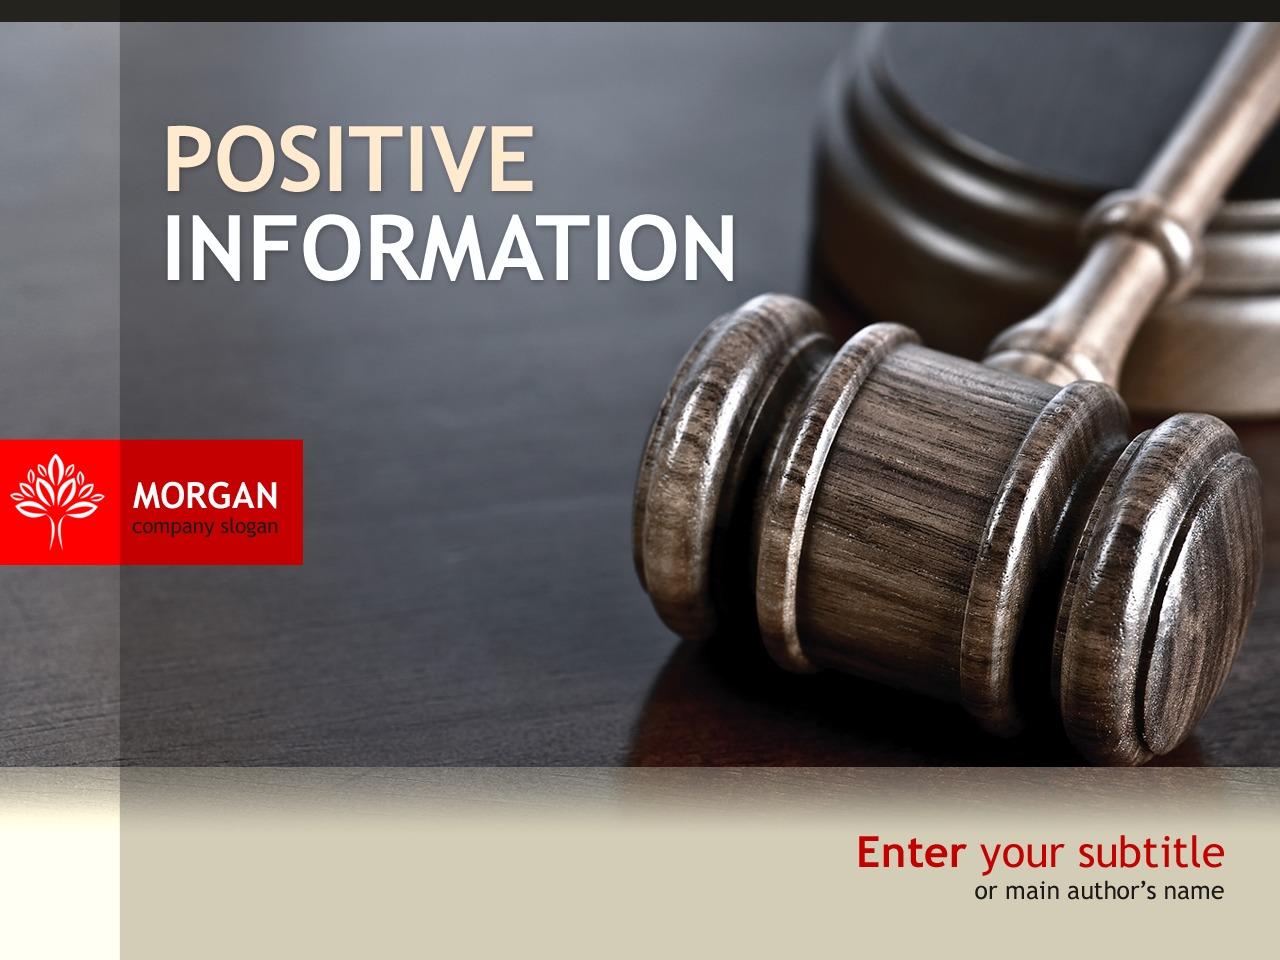 Szablon PowerPoint #32099 na temat: prawnik